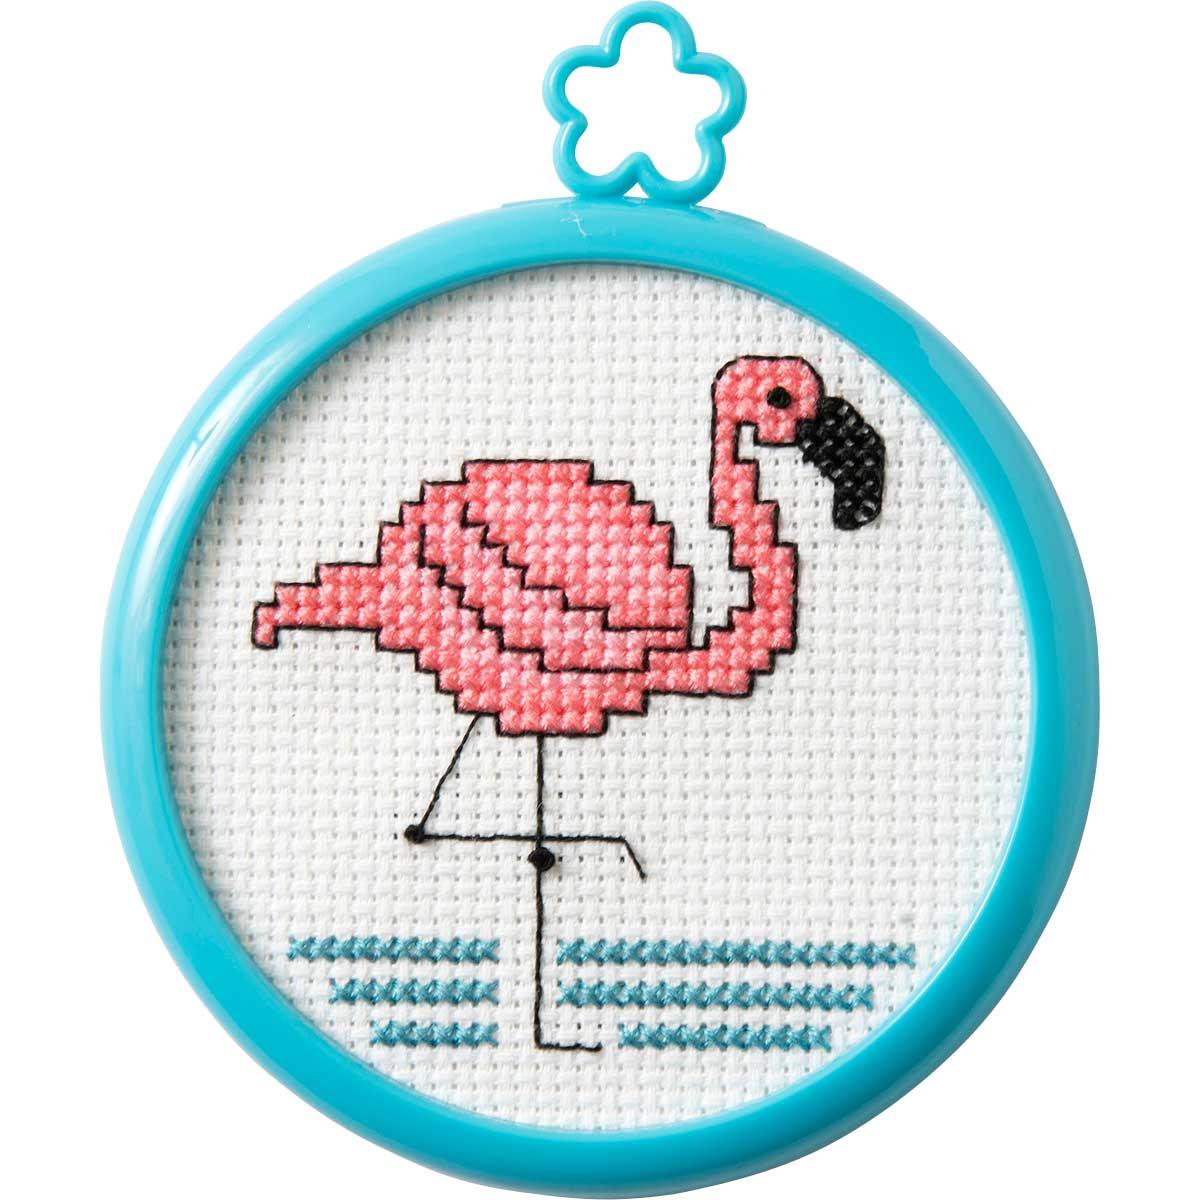 Bucilla ® My 1st Stitch™ - Counted Cross Stitch Kits - Mini - Tropical Flamingo